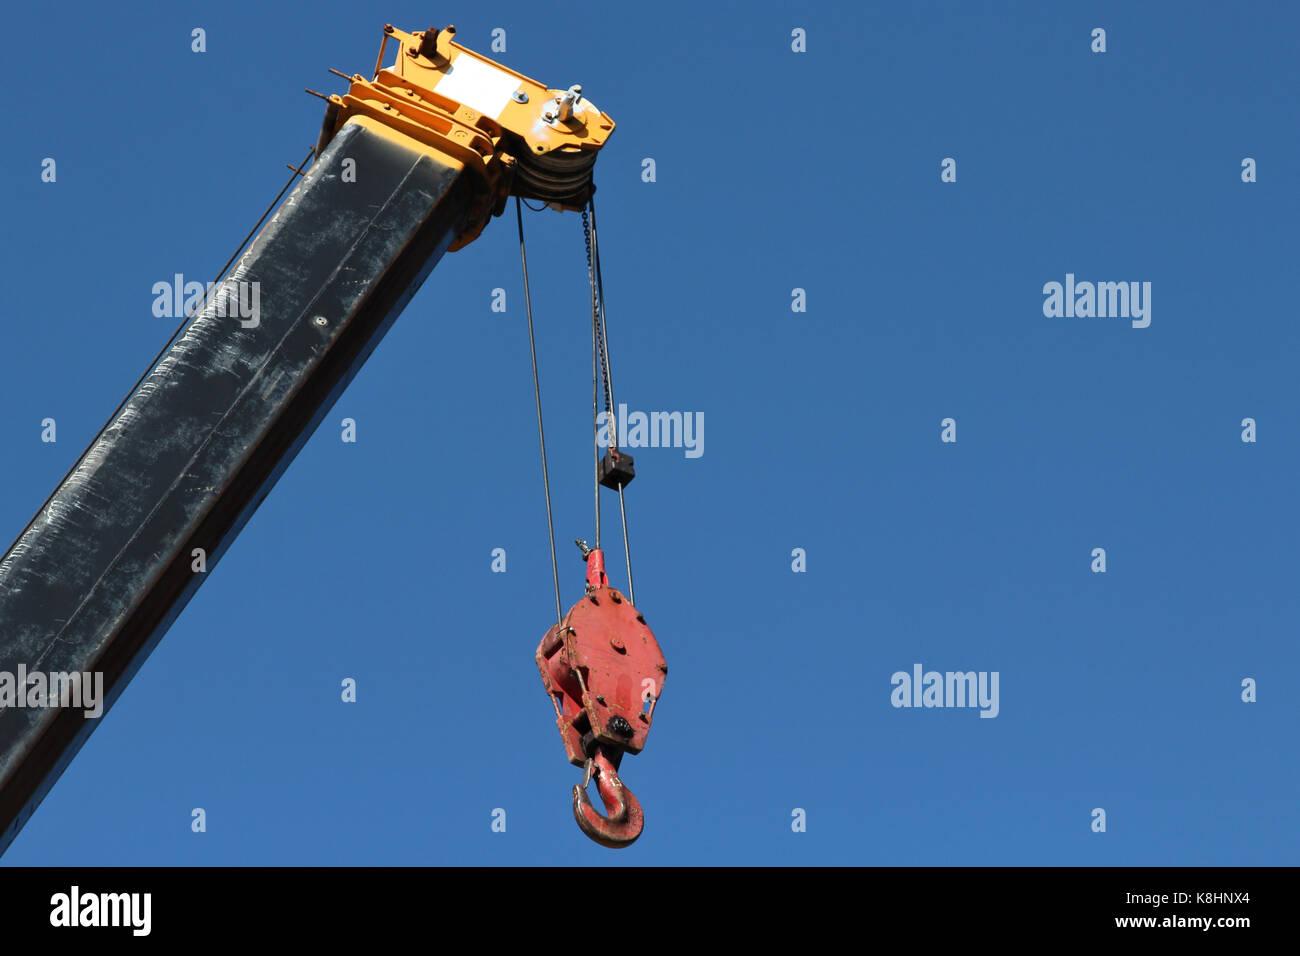 telescopic crane against blue sky - Stock Image